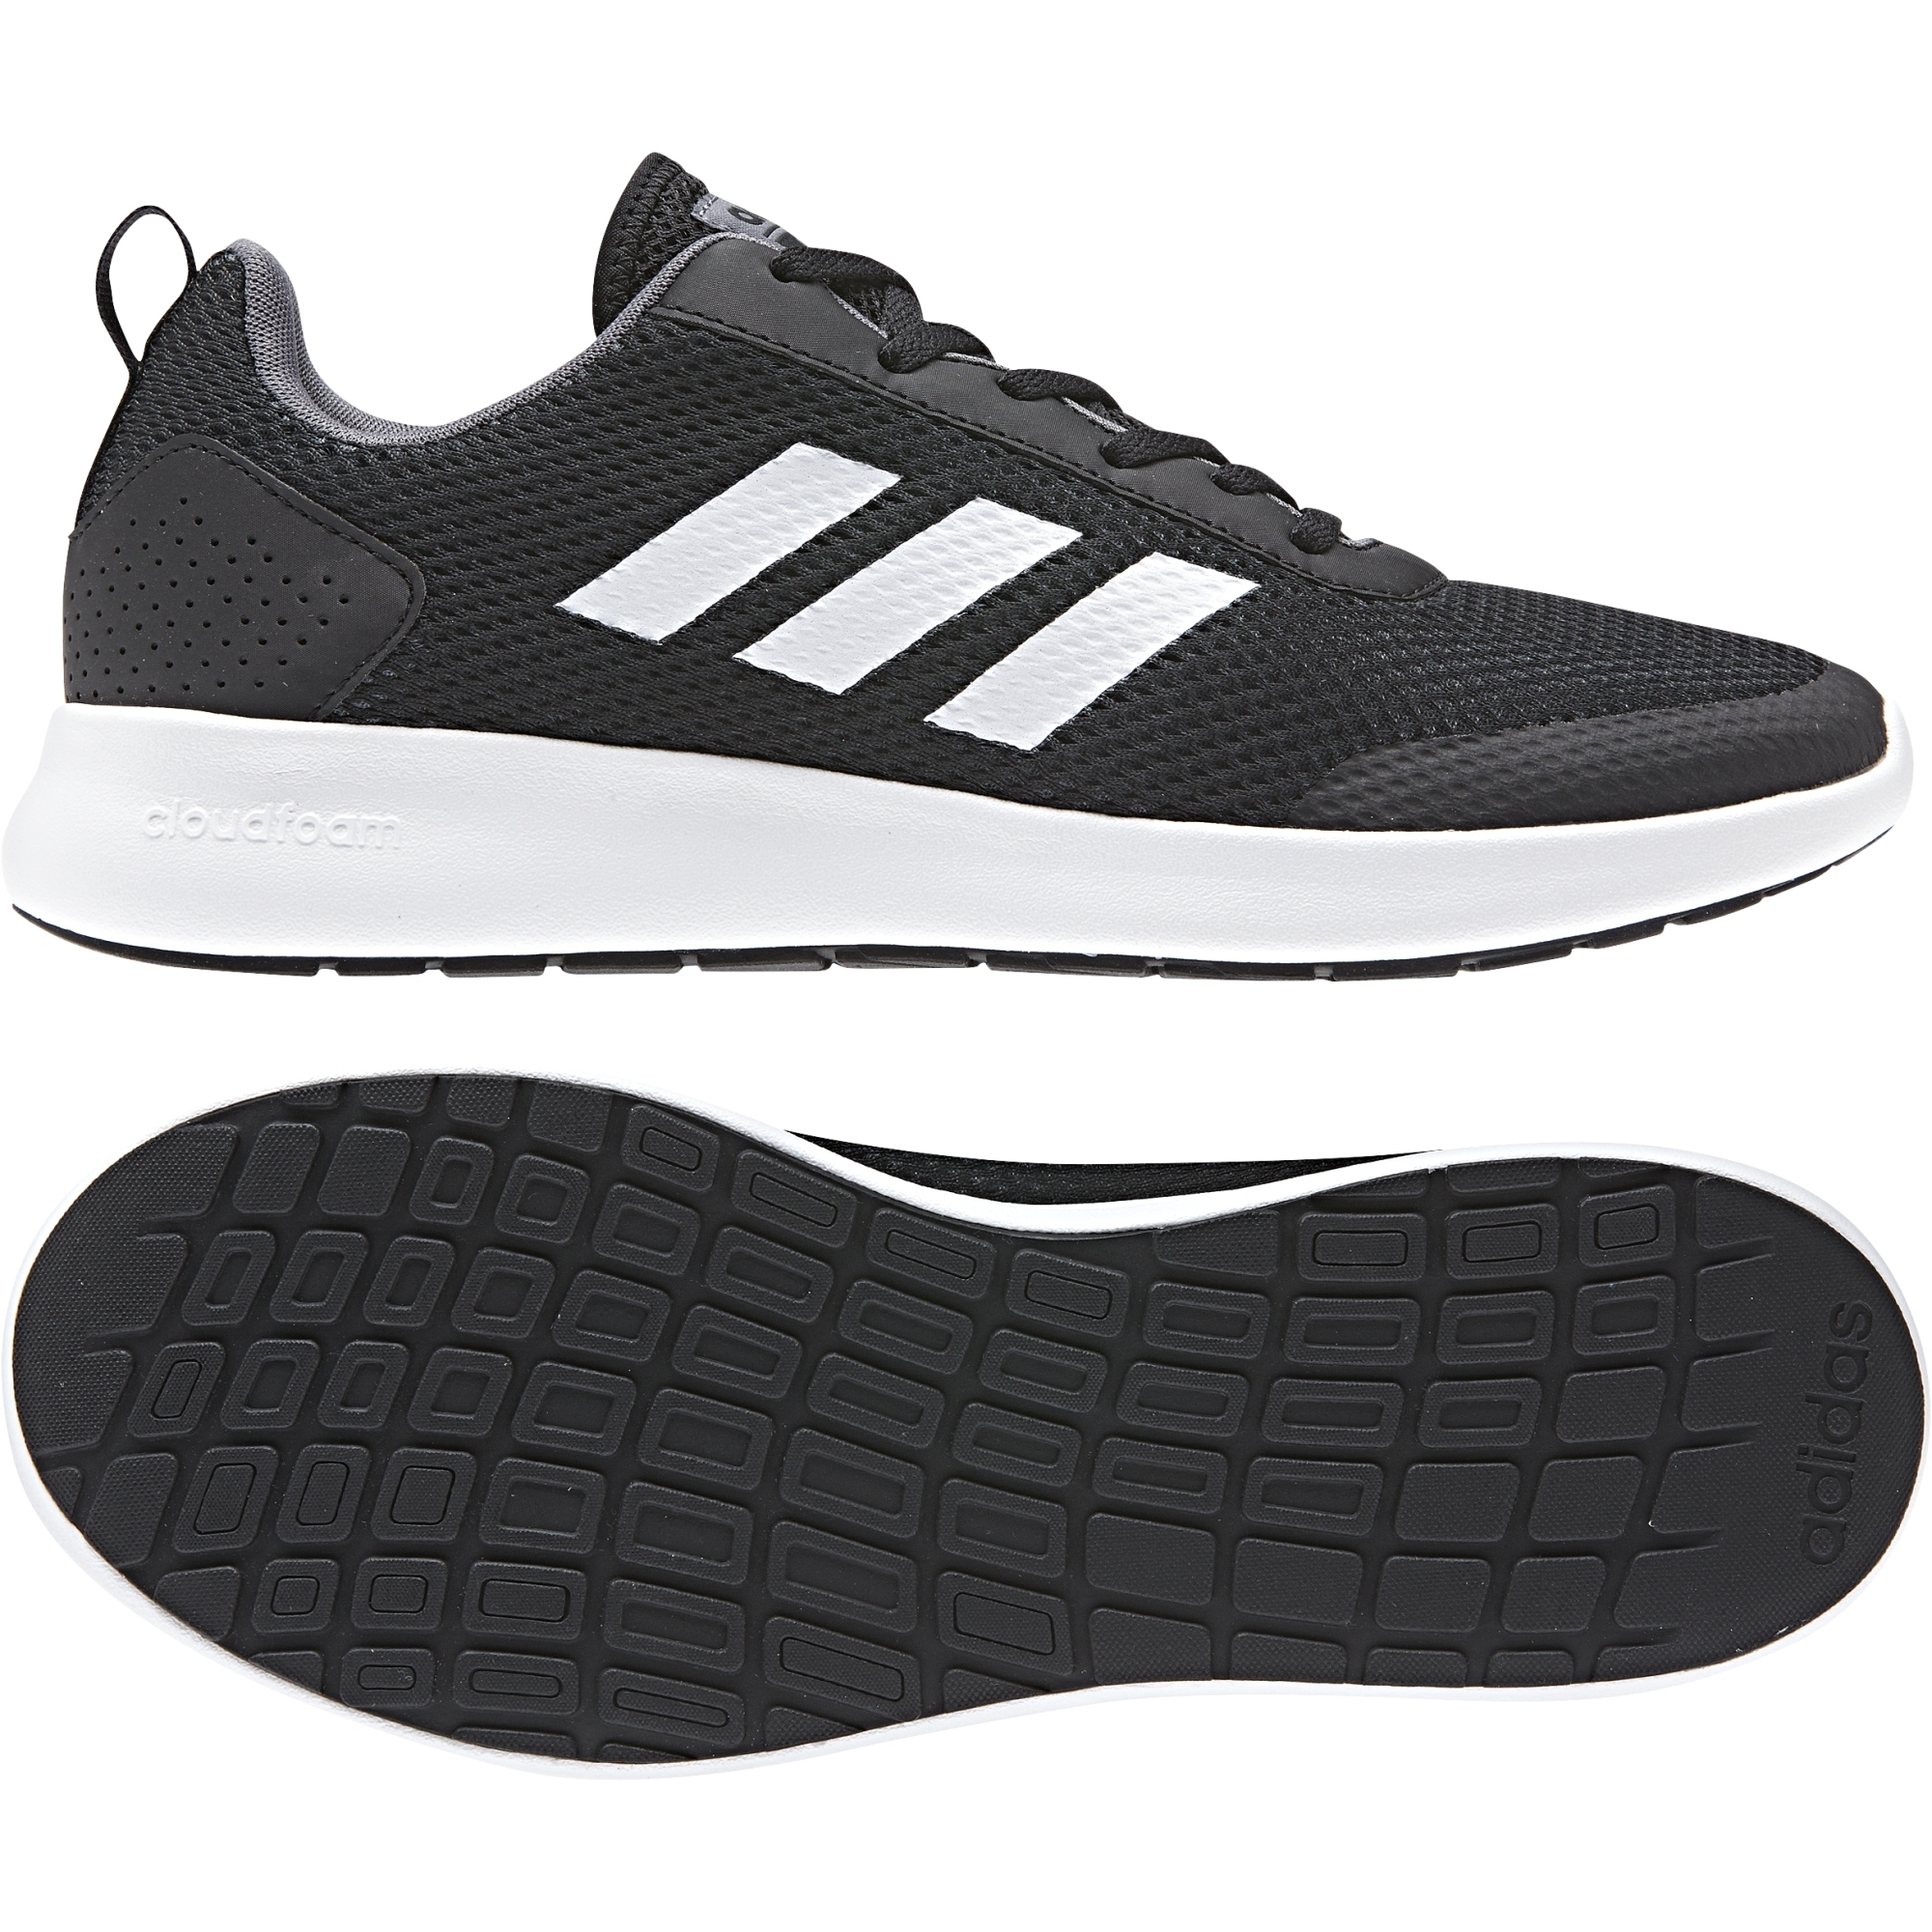 adidas running element race shoes online -